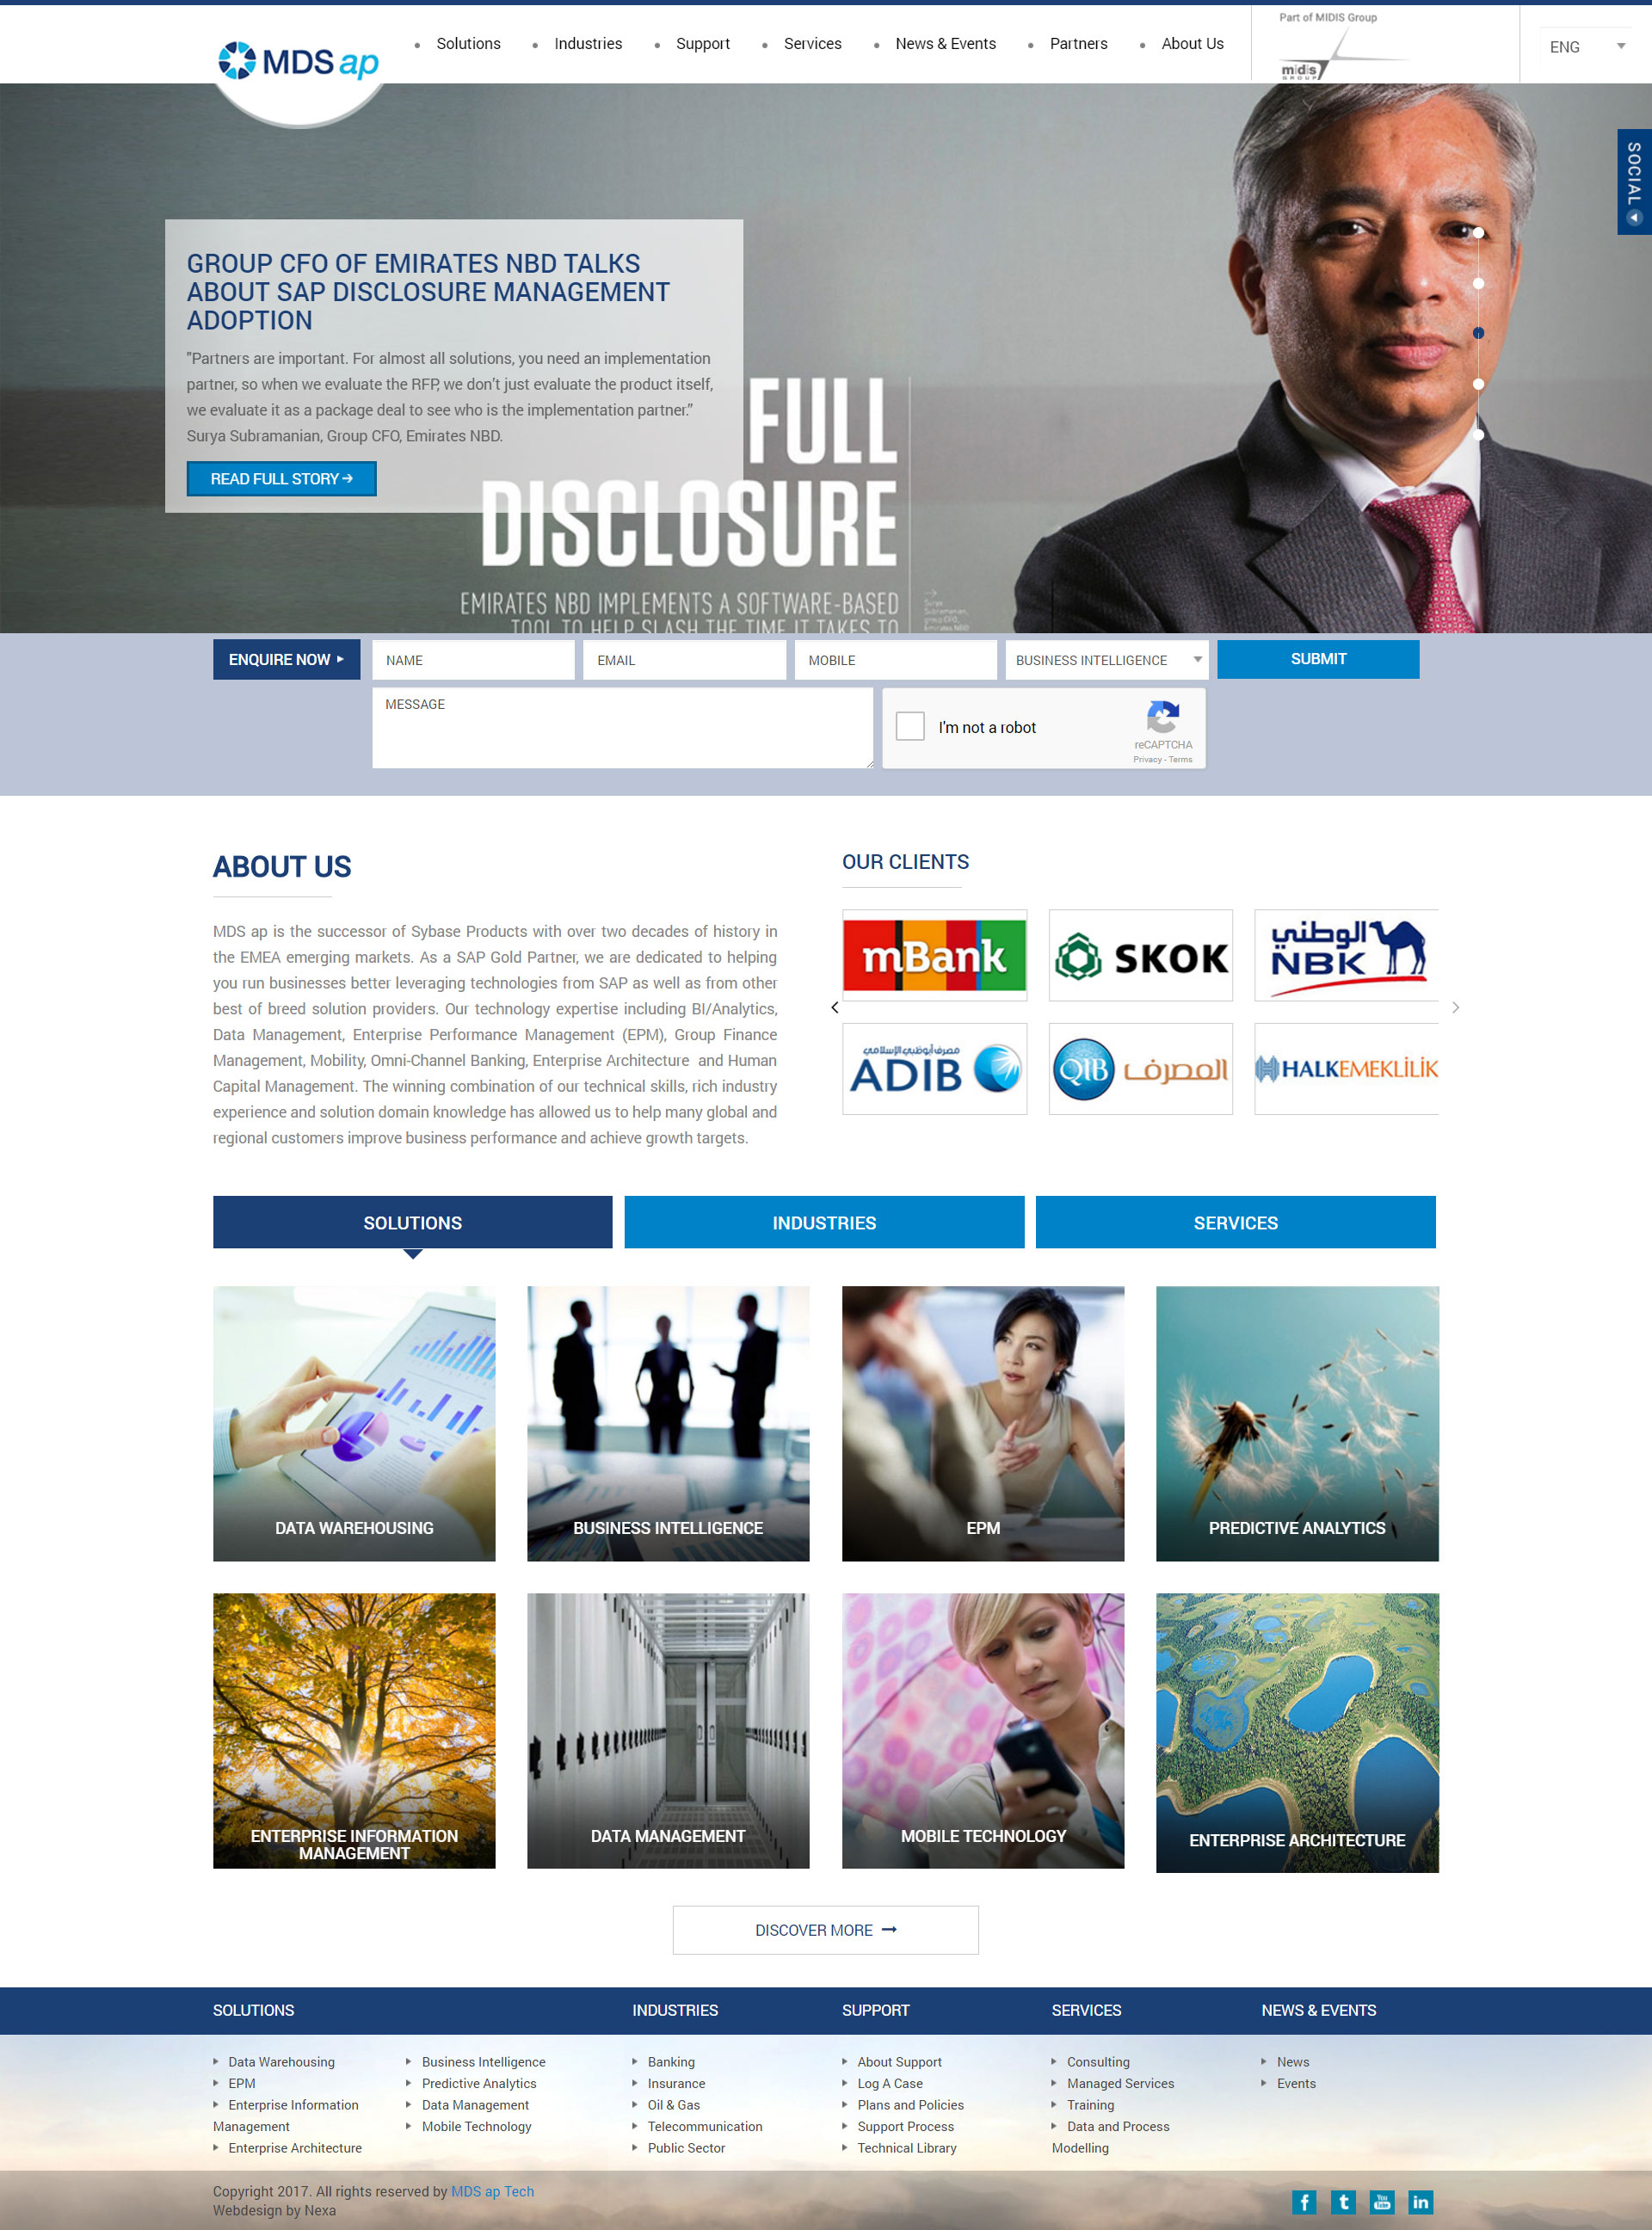 MDS ap Website by Nexa Digital, Dubai